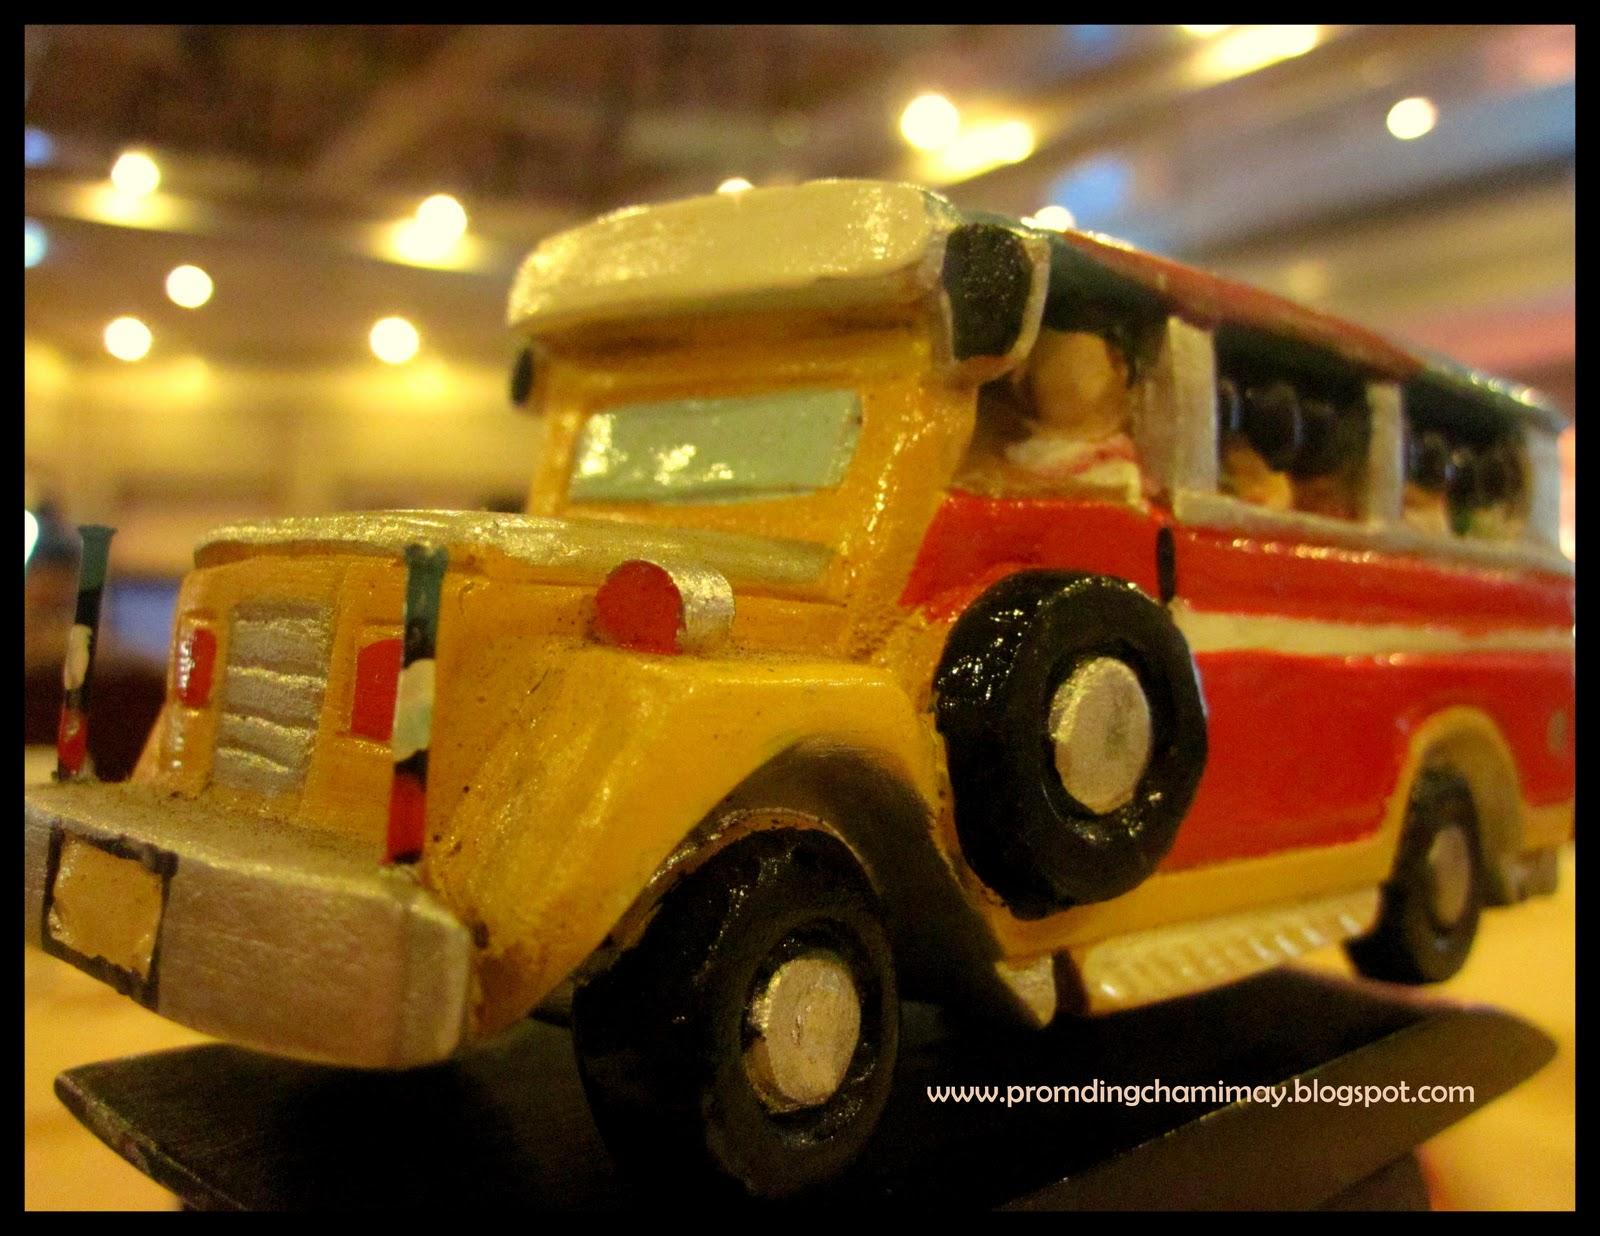 http://2.bp.blogspot.com/_8HPo3fAMpn0/TMxIiwh7hcI/AAAAAAAAAac/0rH7Xoc_cZc/s1600/the+jeep!.jpg